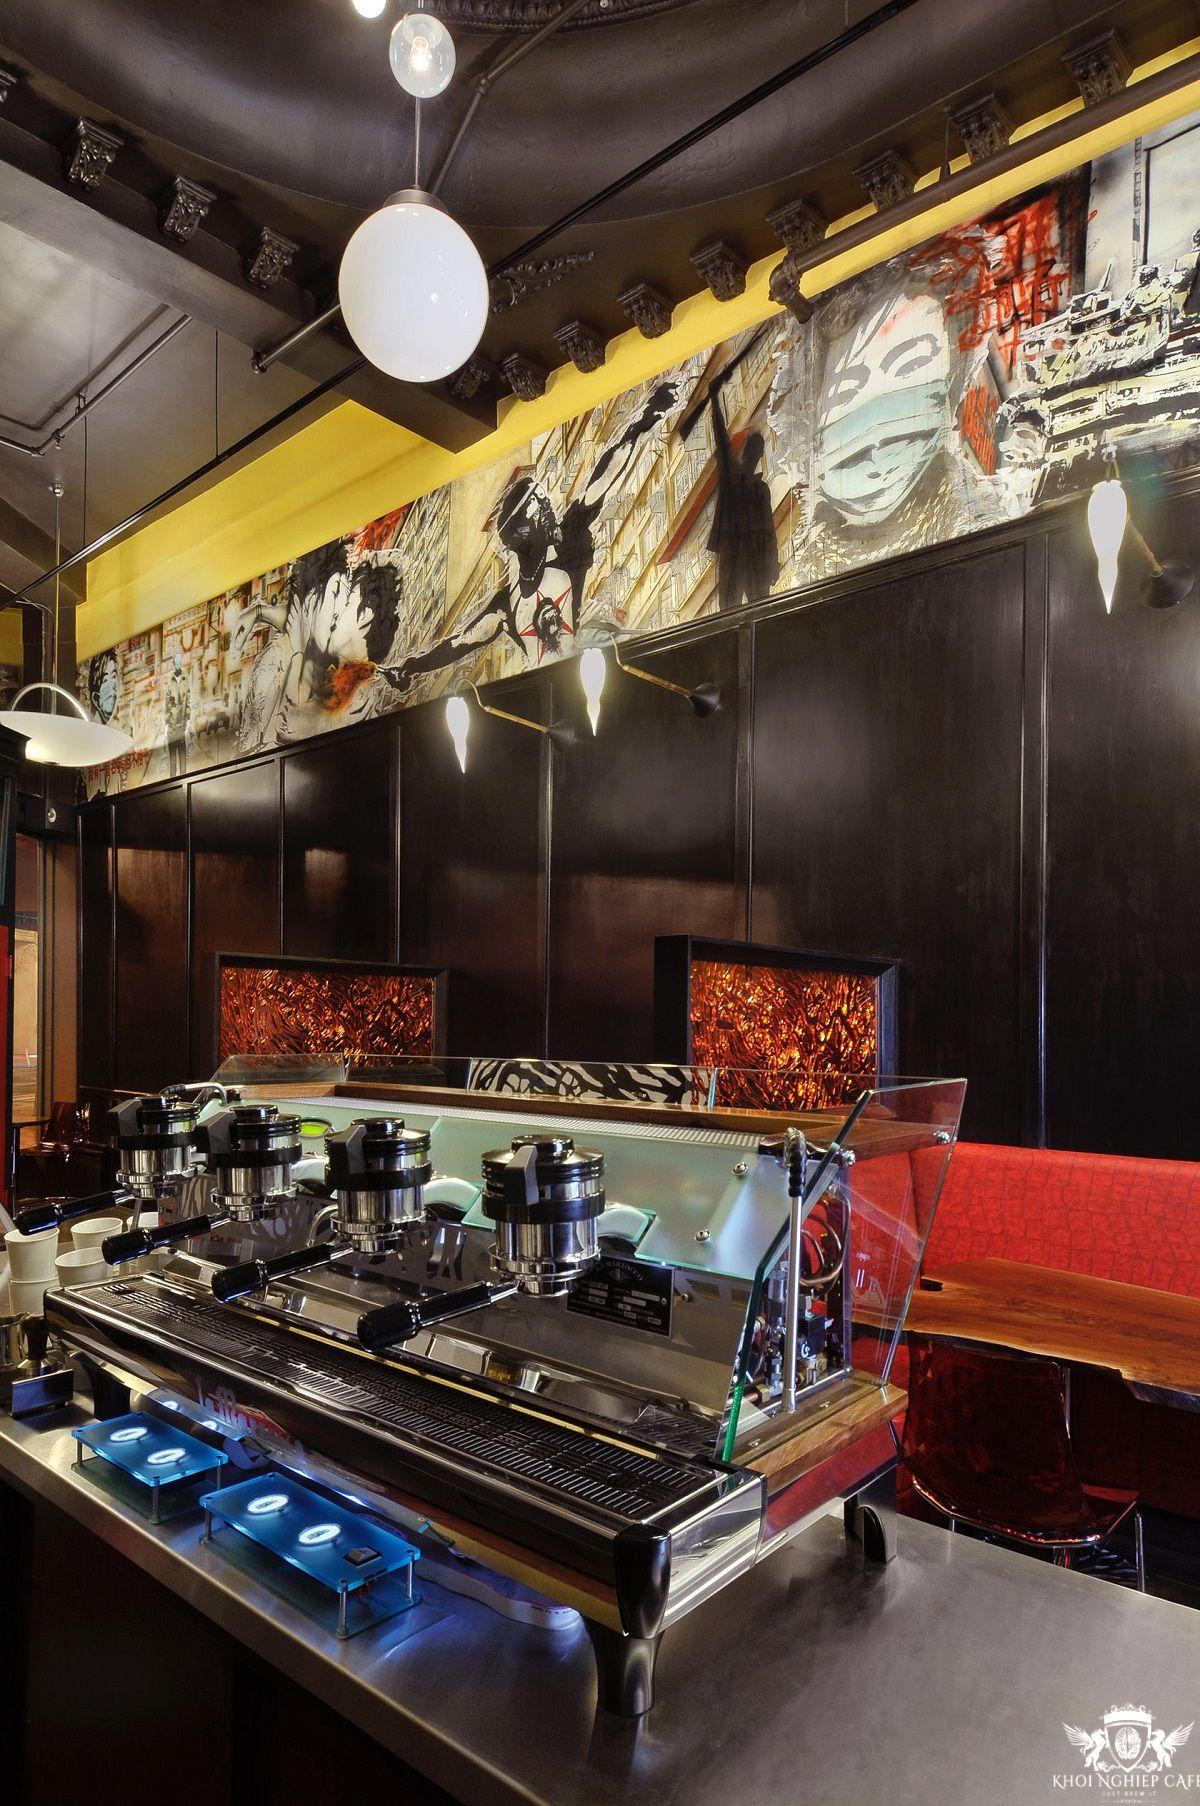 Mavelous Coffee & Wine Bar cach thiet ke bar cafe hien dai sang trong 2018 (3)